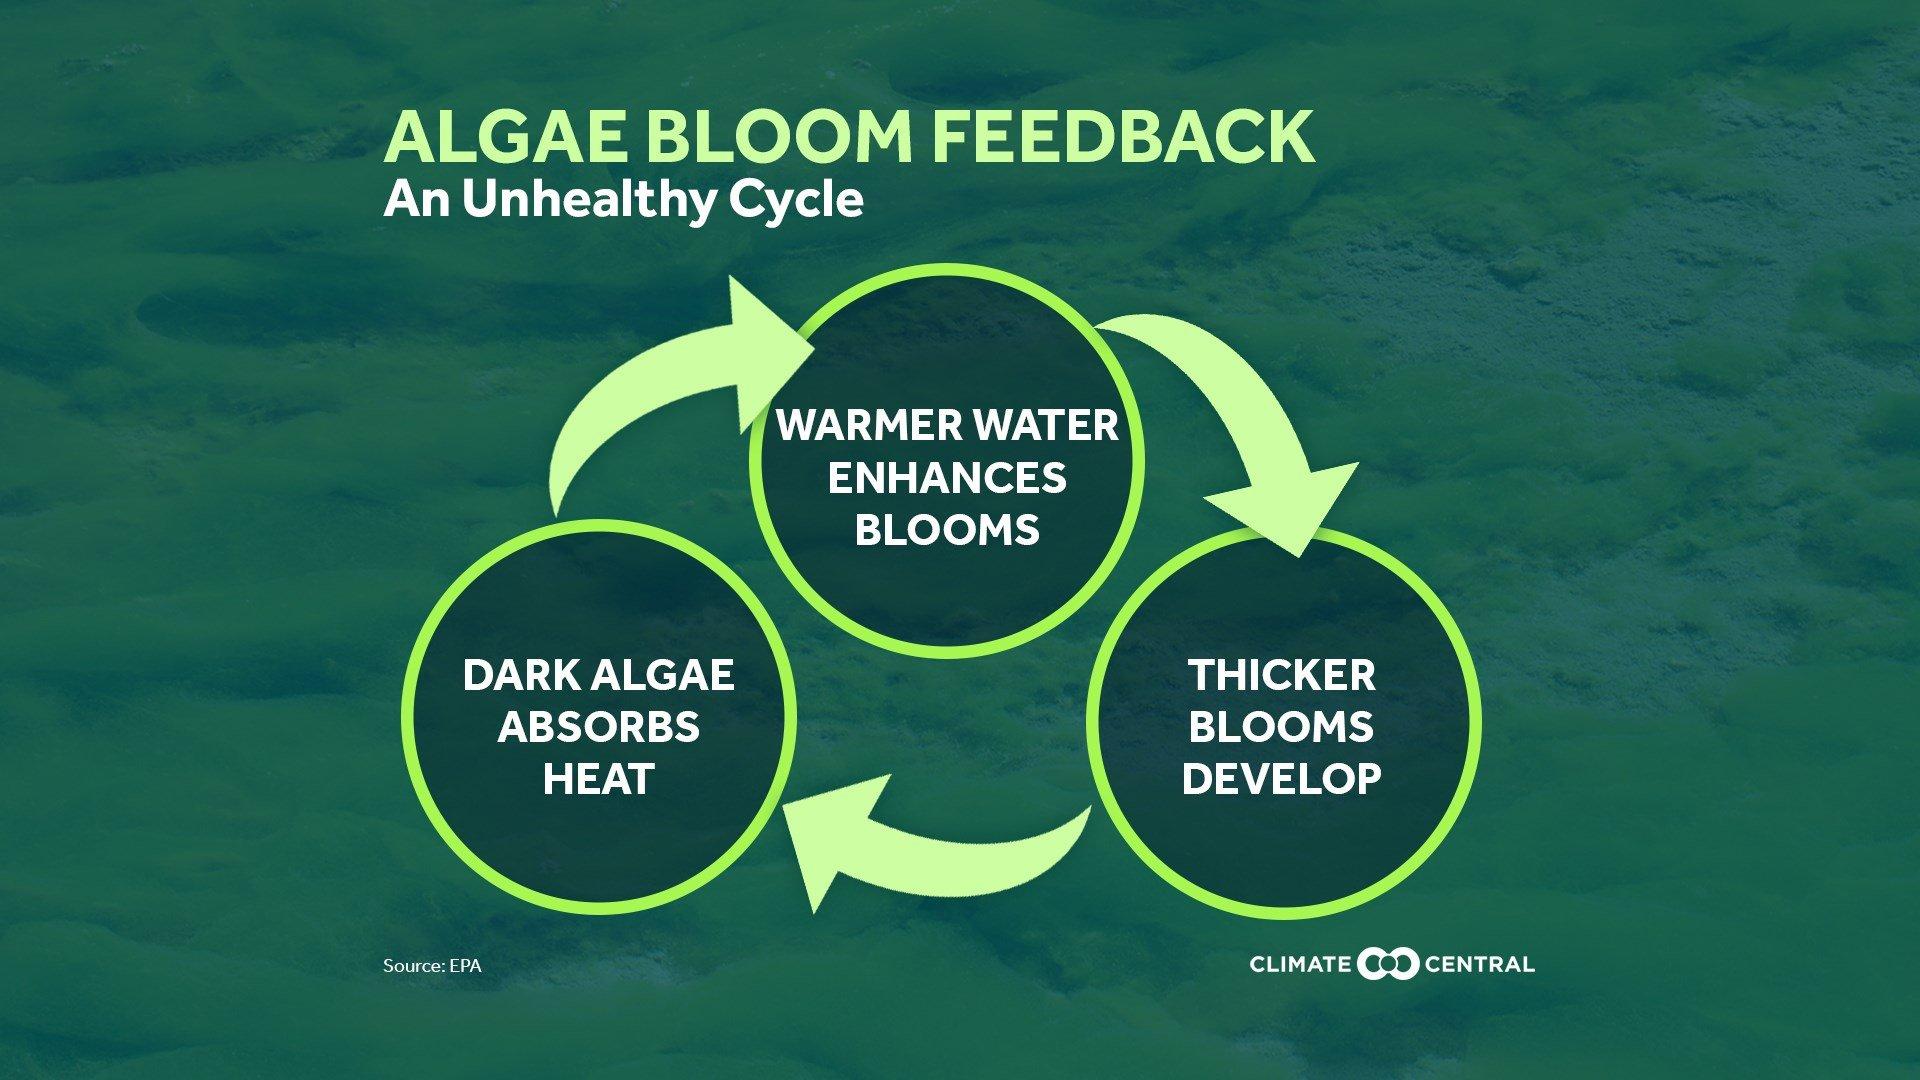 Algae Blooms & Climate Change